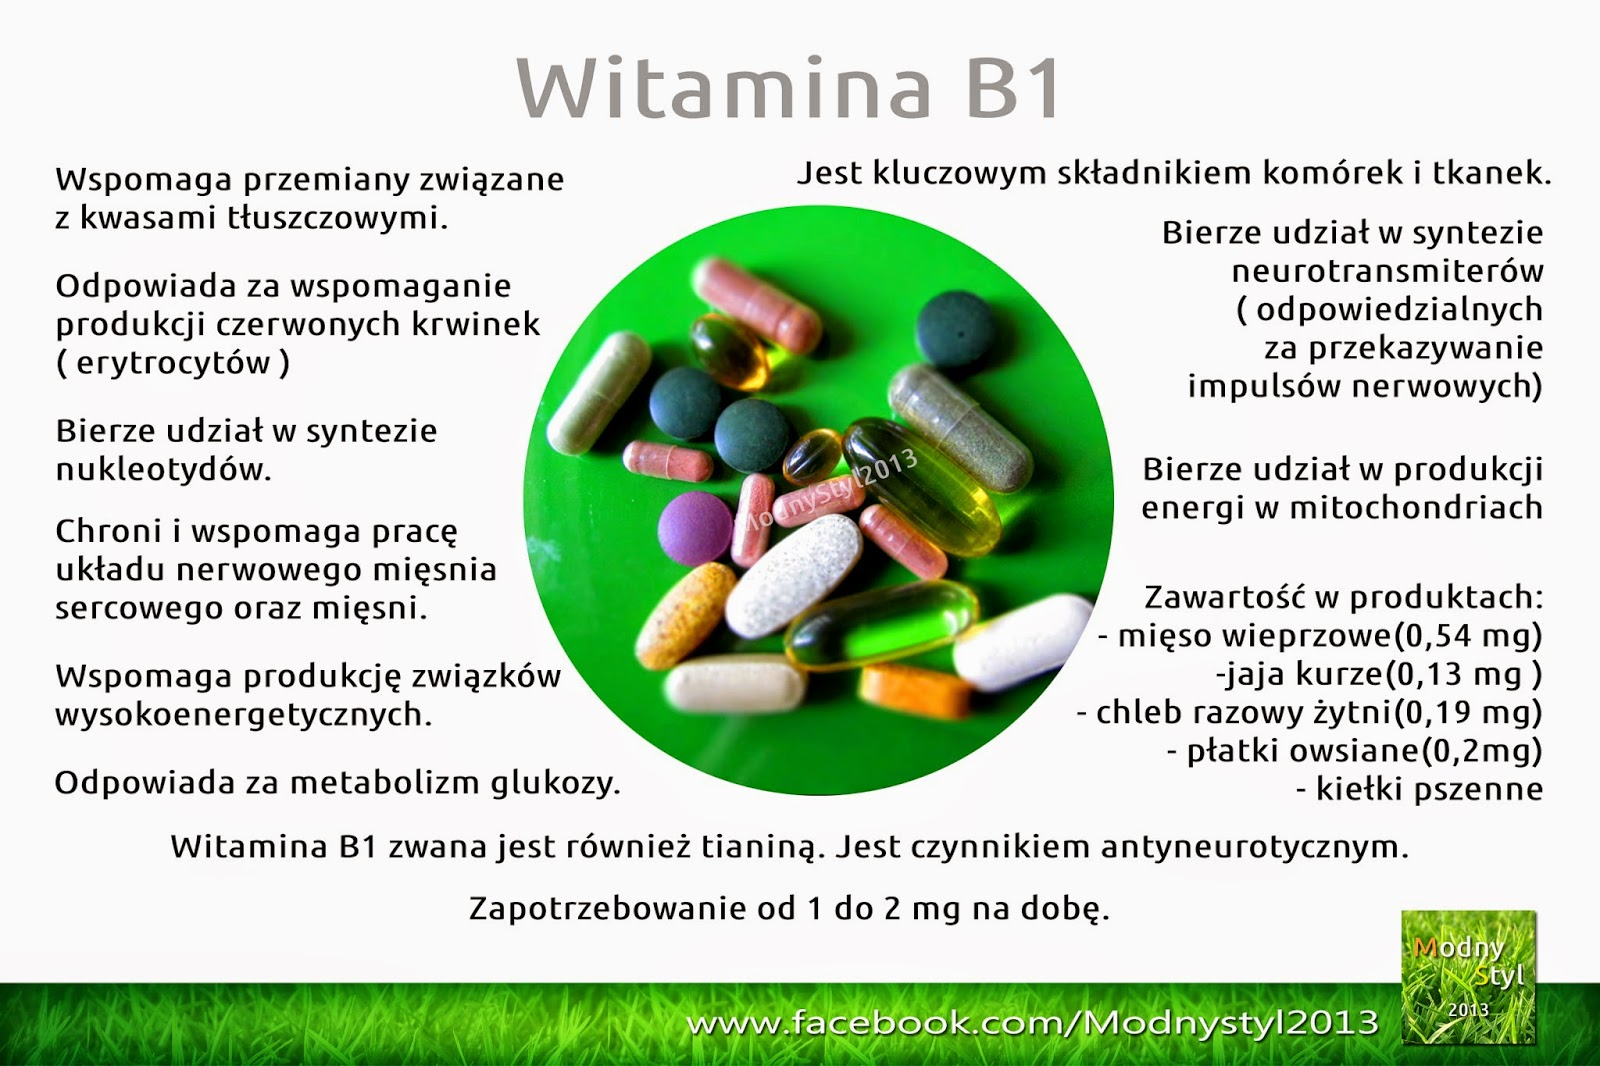 Witamina B1 zwana tiaminą